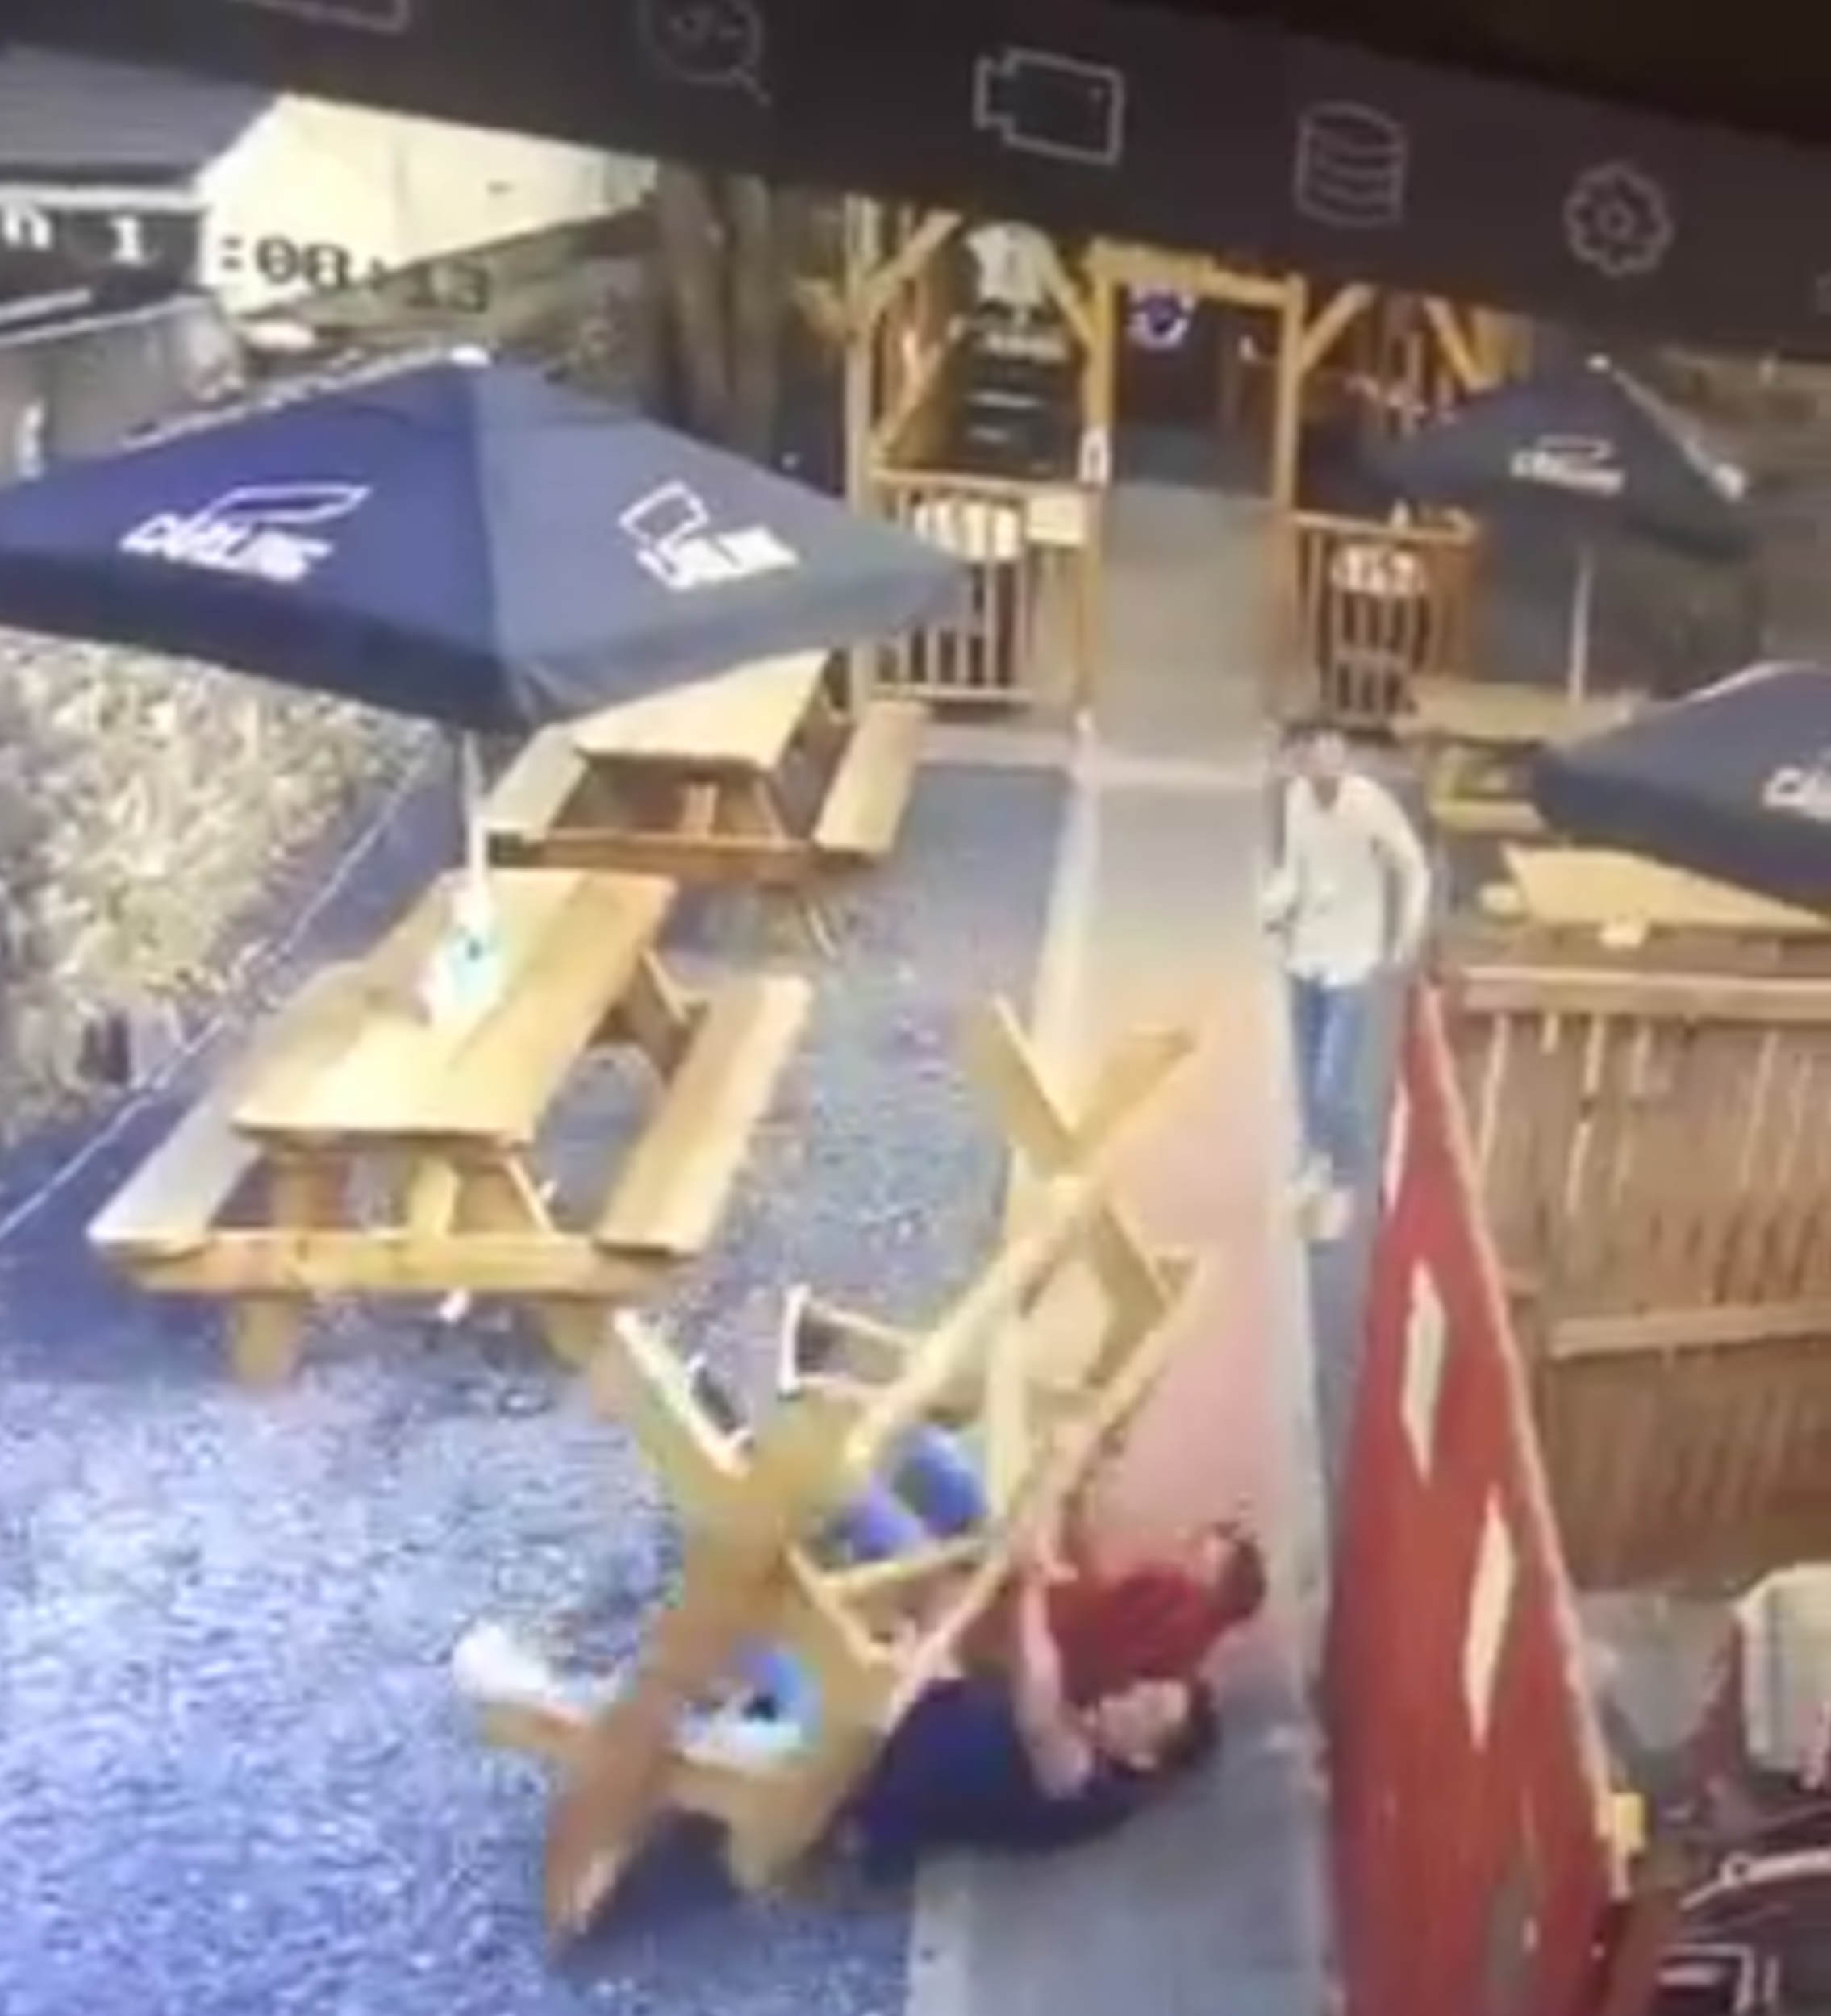 Irish pub table fell over - UK and World News